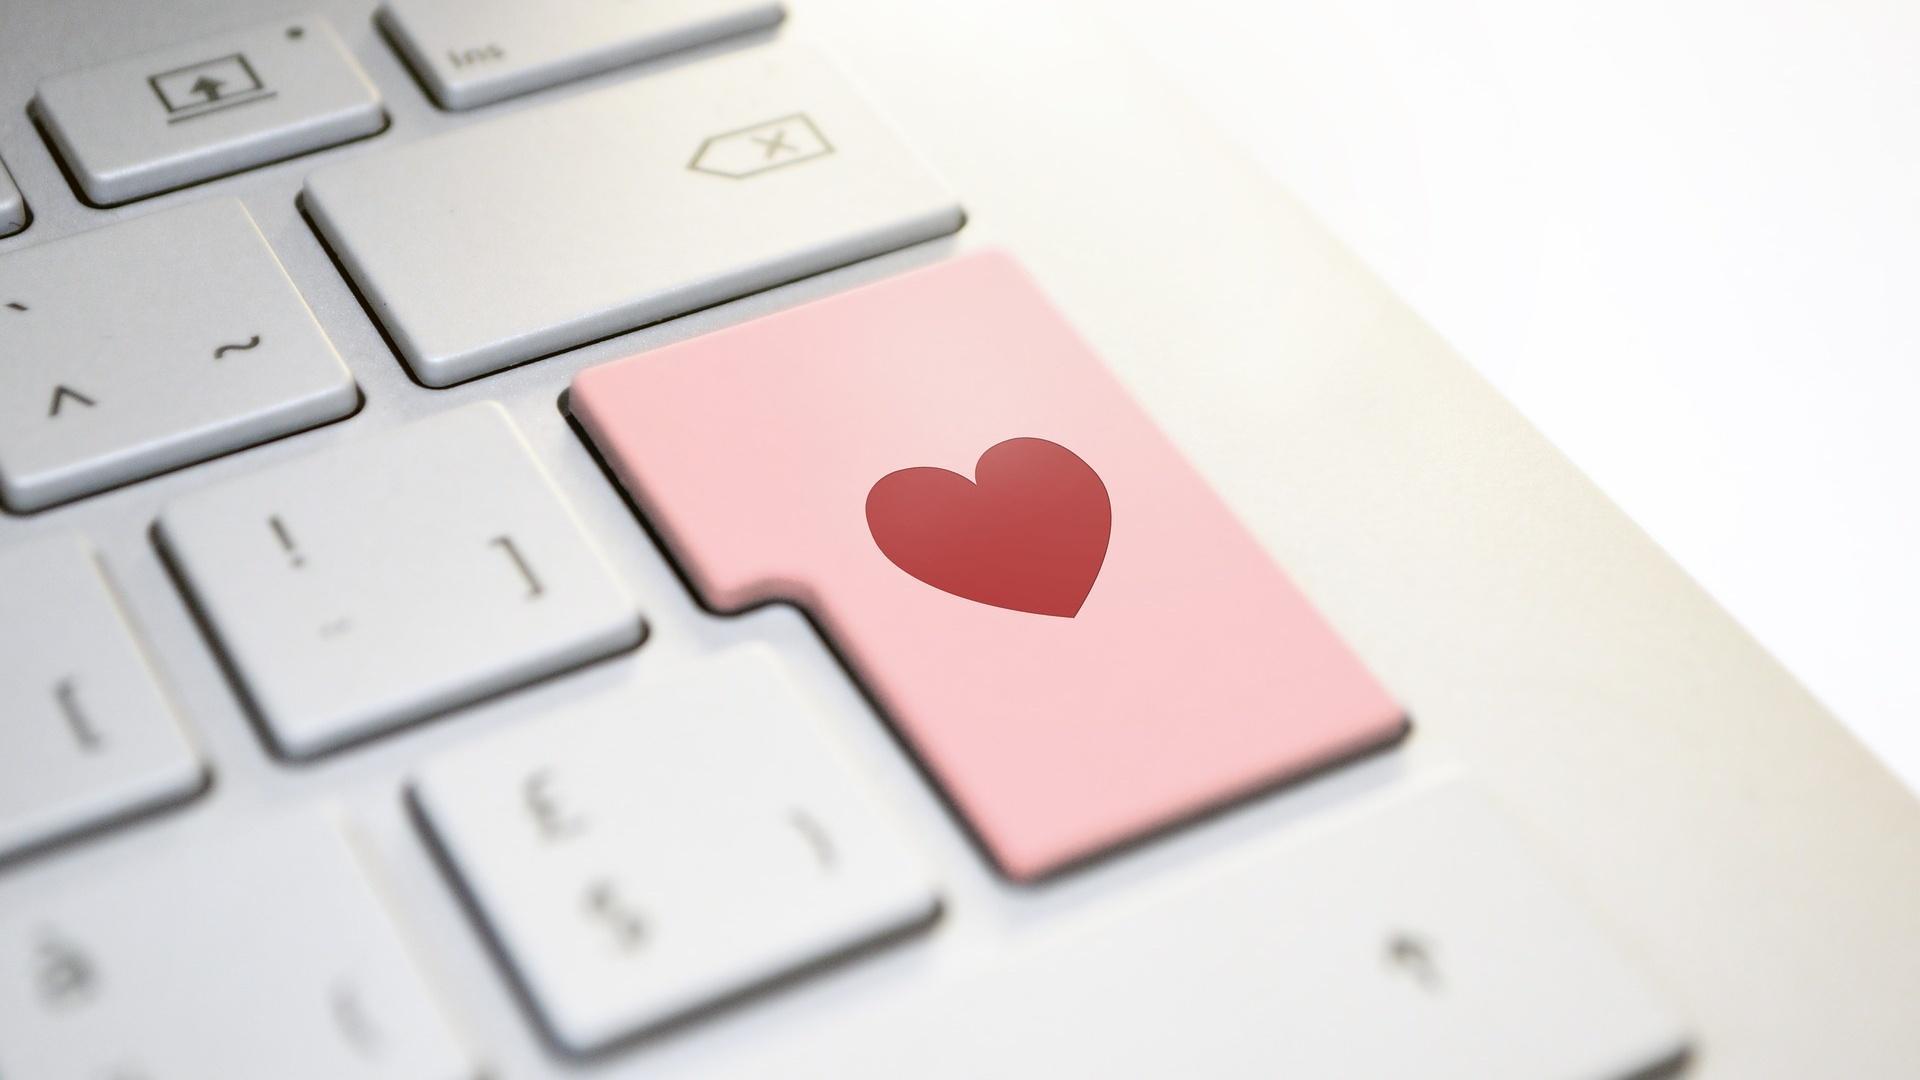 Seriöse Singlebörsen - die 5 besten Dating-Sites